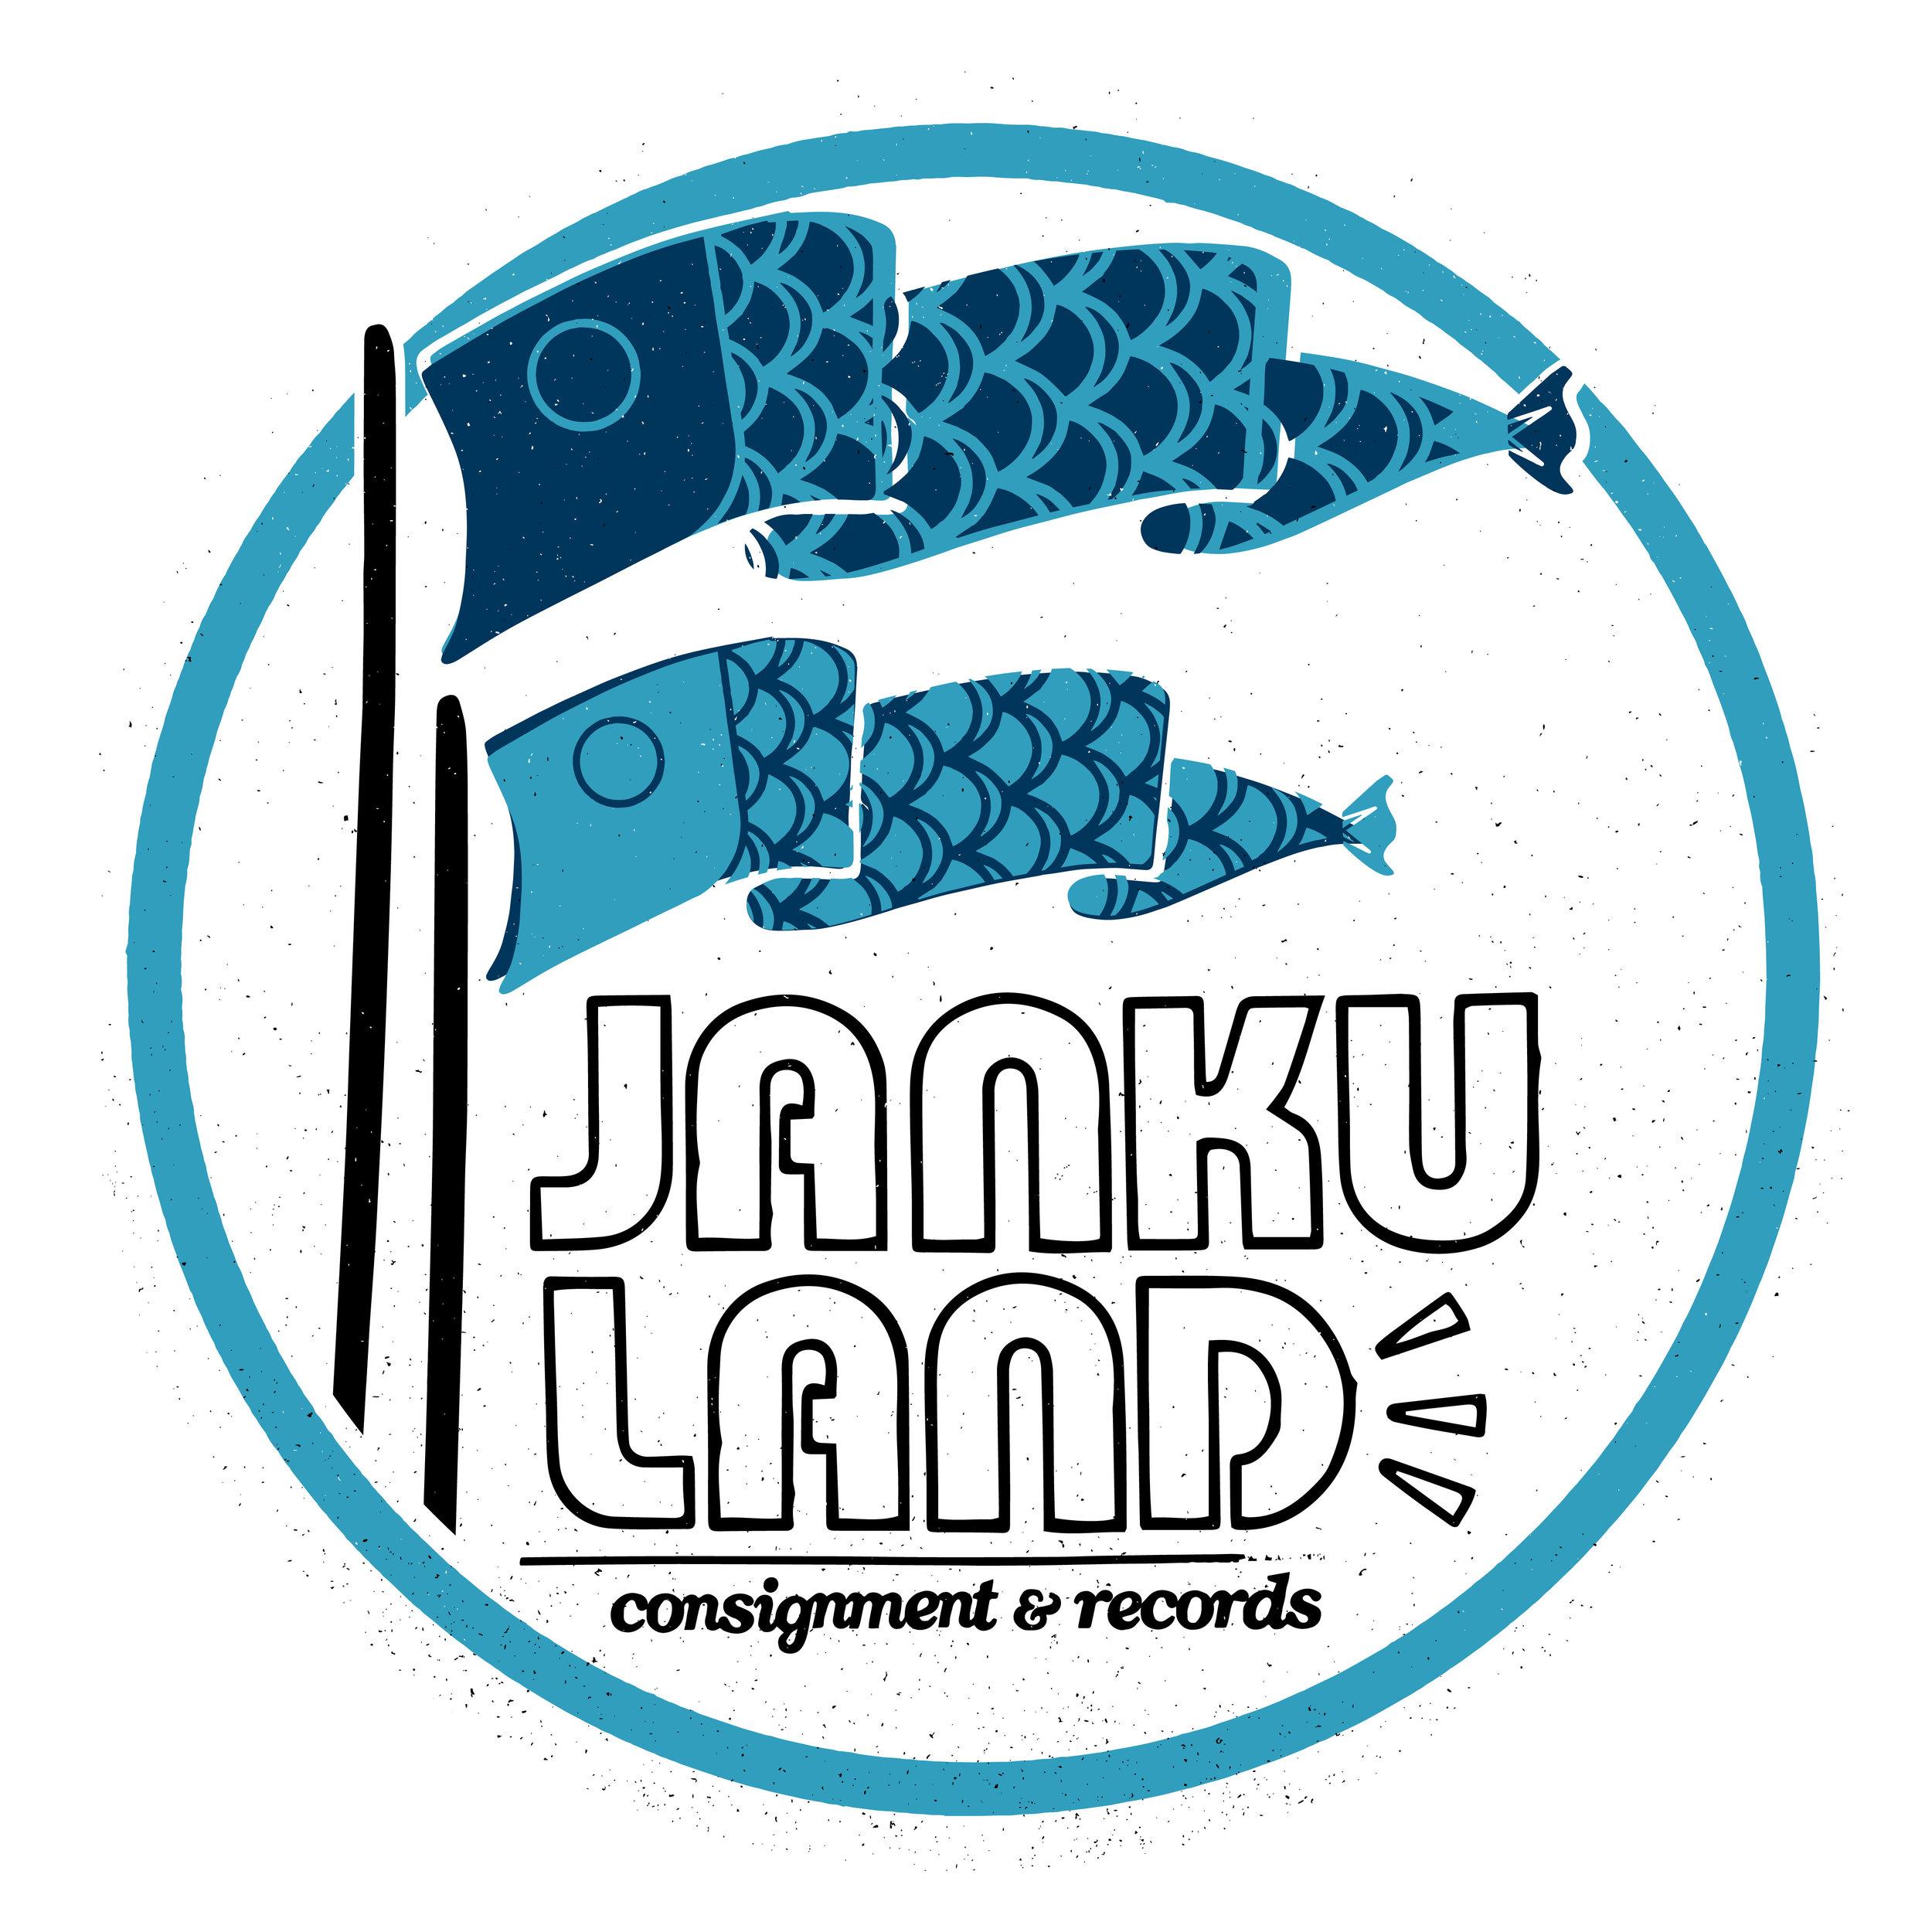 JankuLand-circle logo.jpg